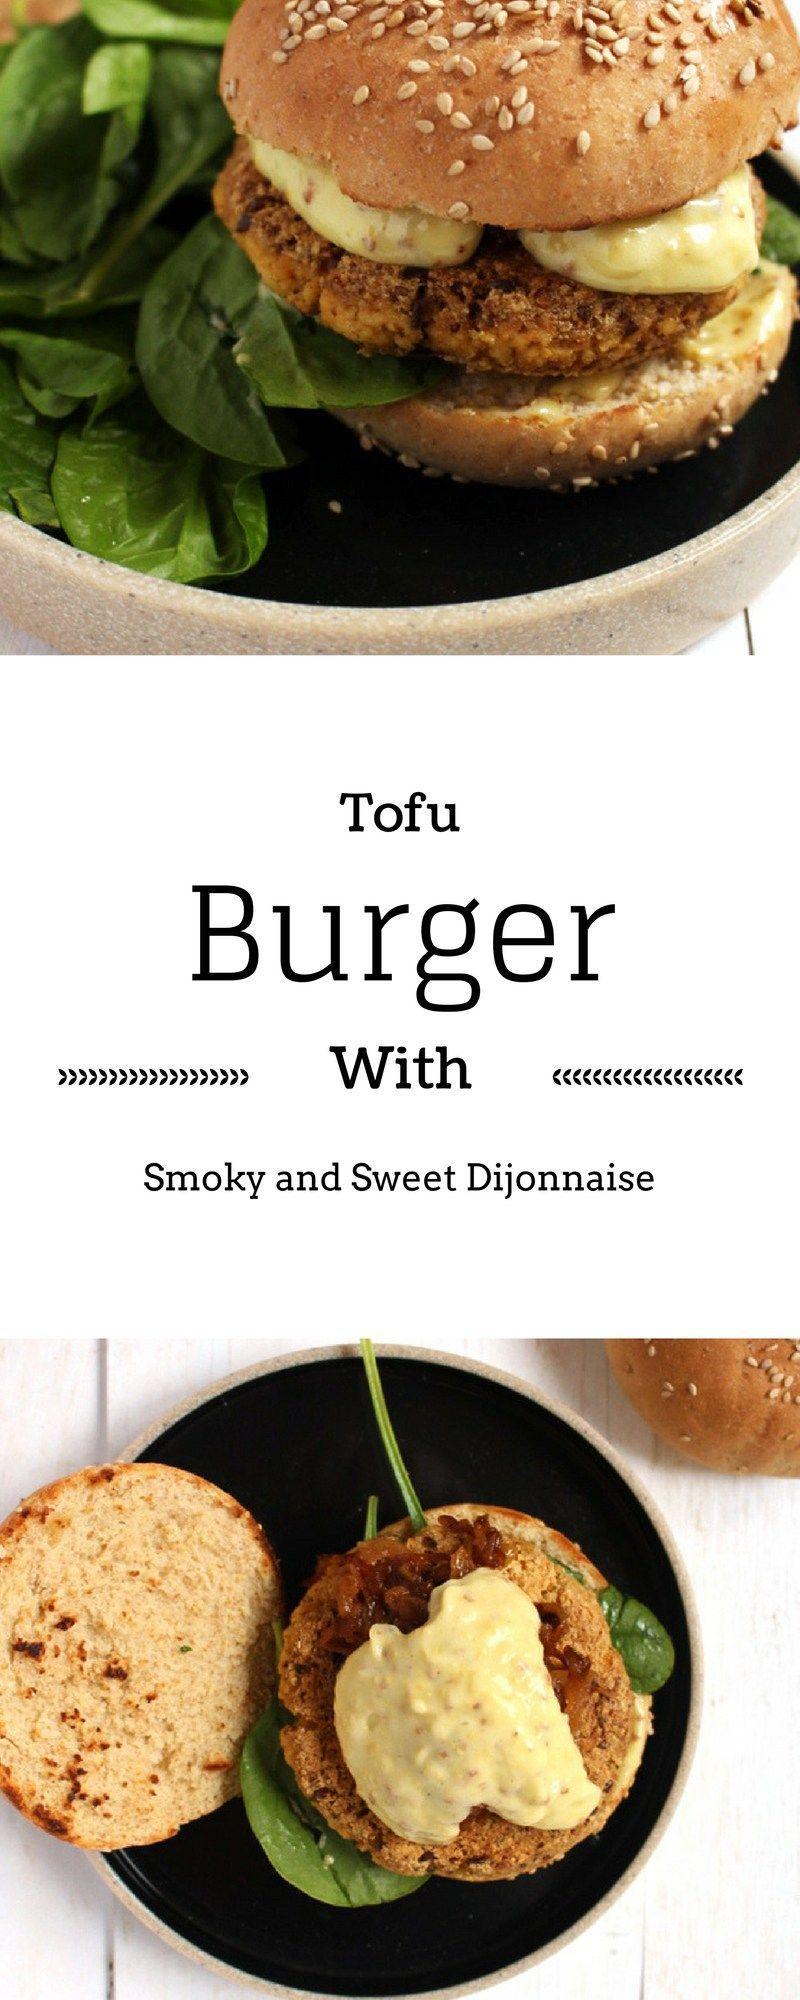 Tofu Burger With Caramelized Onions And Sweet And Smoky Dijonnaise Karamellisierte Zwiebeln Rezepte Tofu